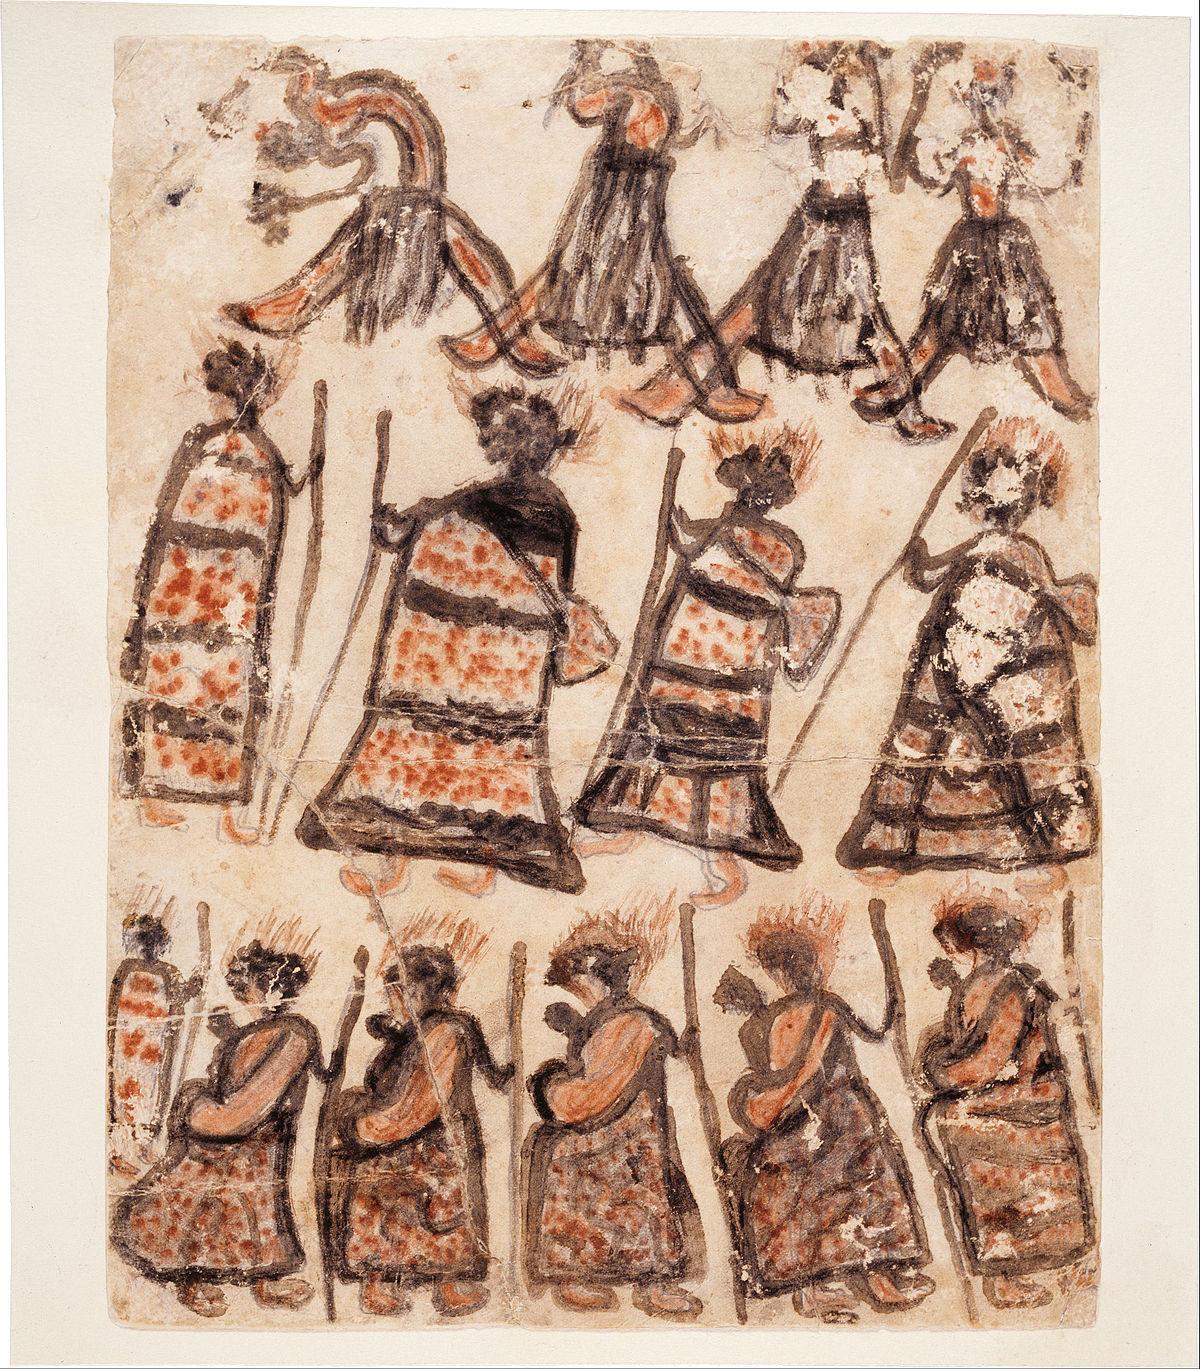 William BARAK - Wurundjeri people - Dancers and women in possum skin cloaks - Google Art Project.jpg